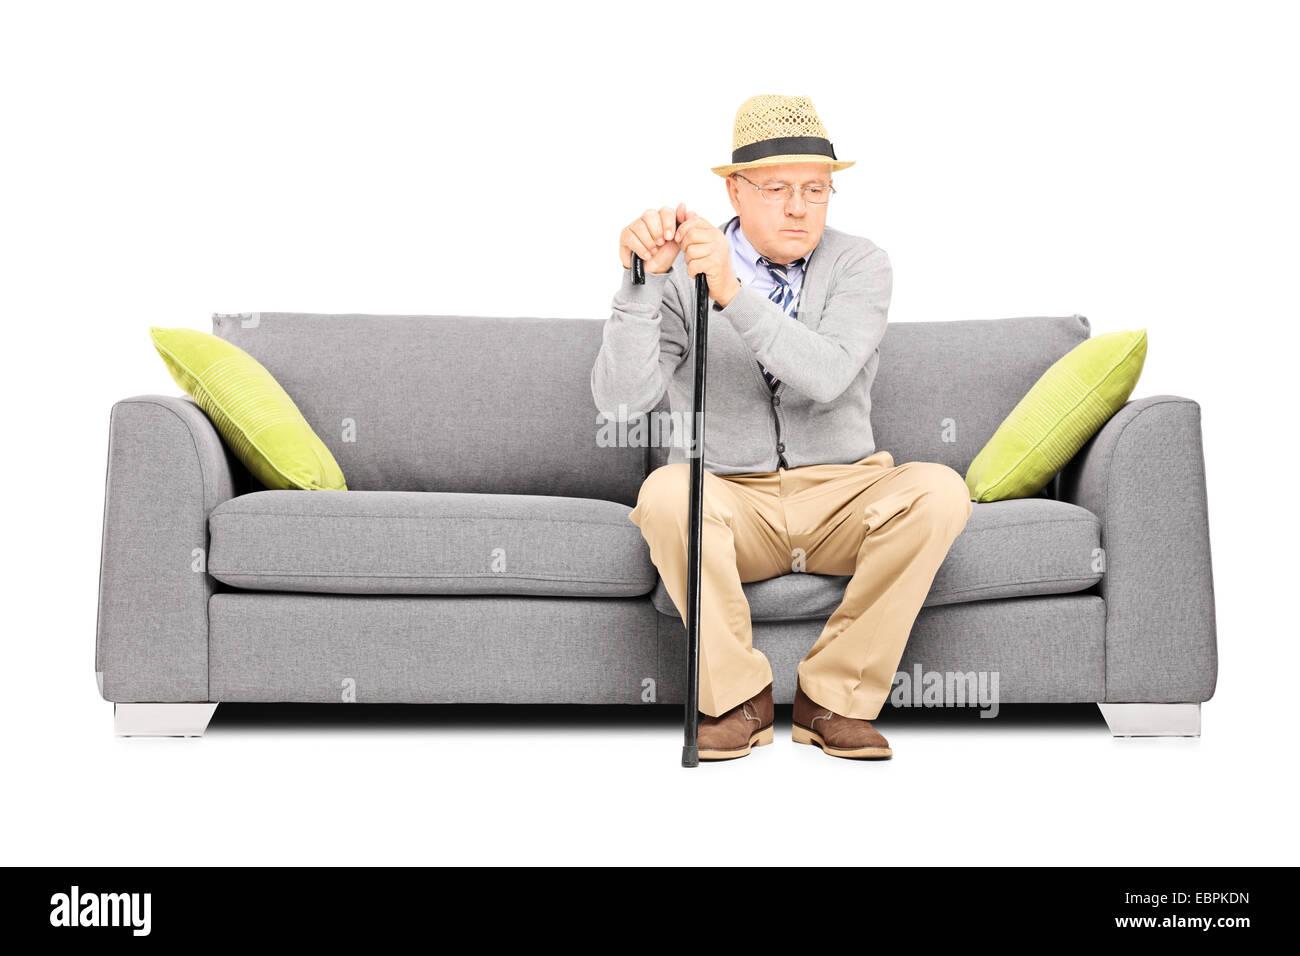 Worried senior gentleman sitting on a sofa isolated on white background - Stock Image